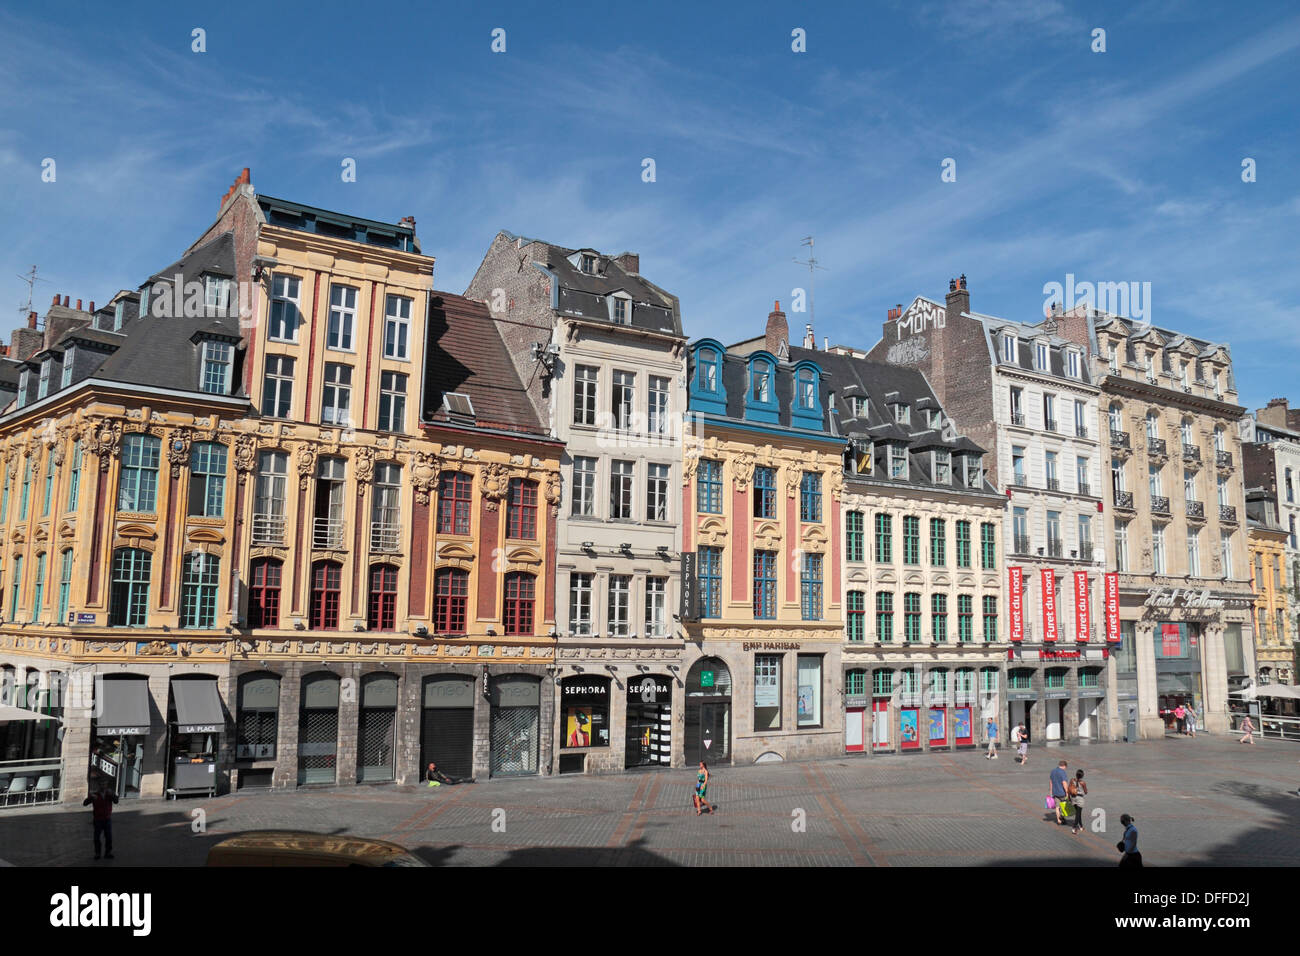 Vista general de los edificios históricos en la Place du Général de Gaulle (Grand Place), Lille, Nord-Pas-de-Calais Nord, Francia. Imagen De Stock